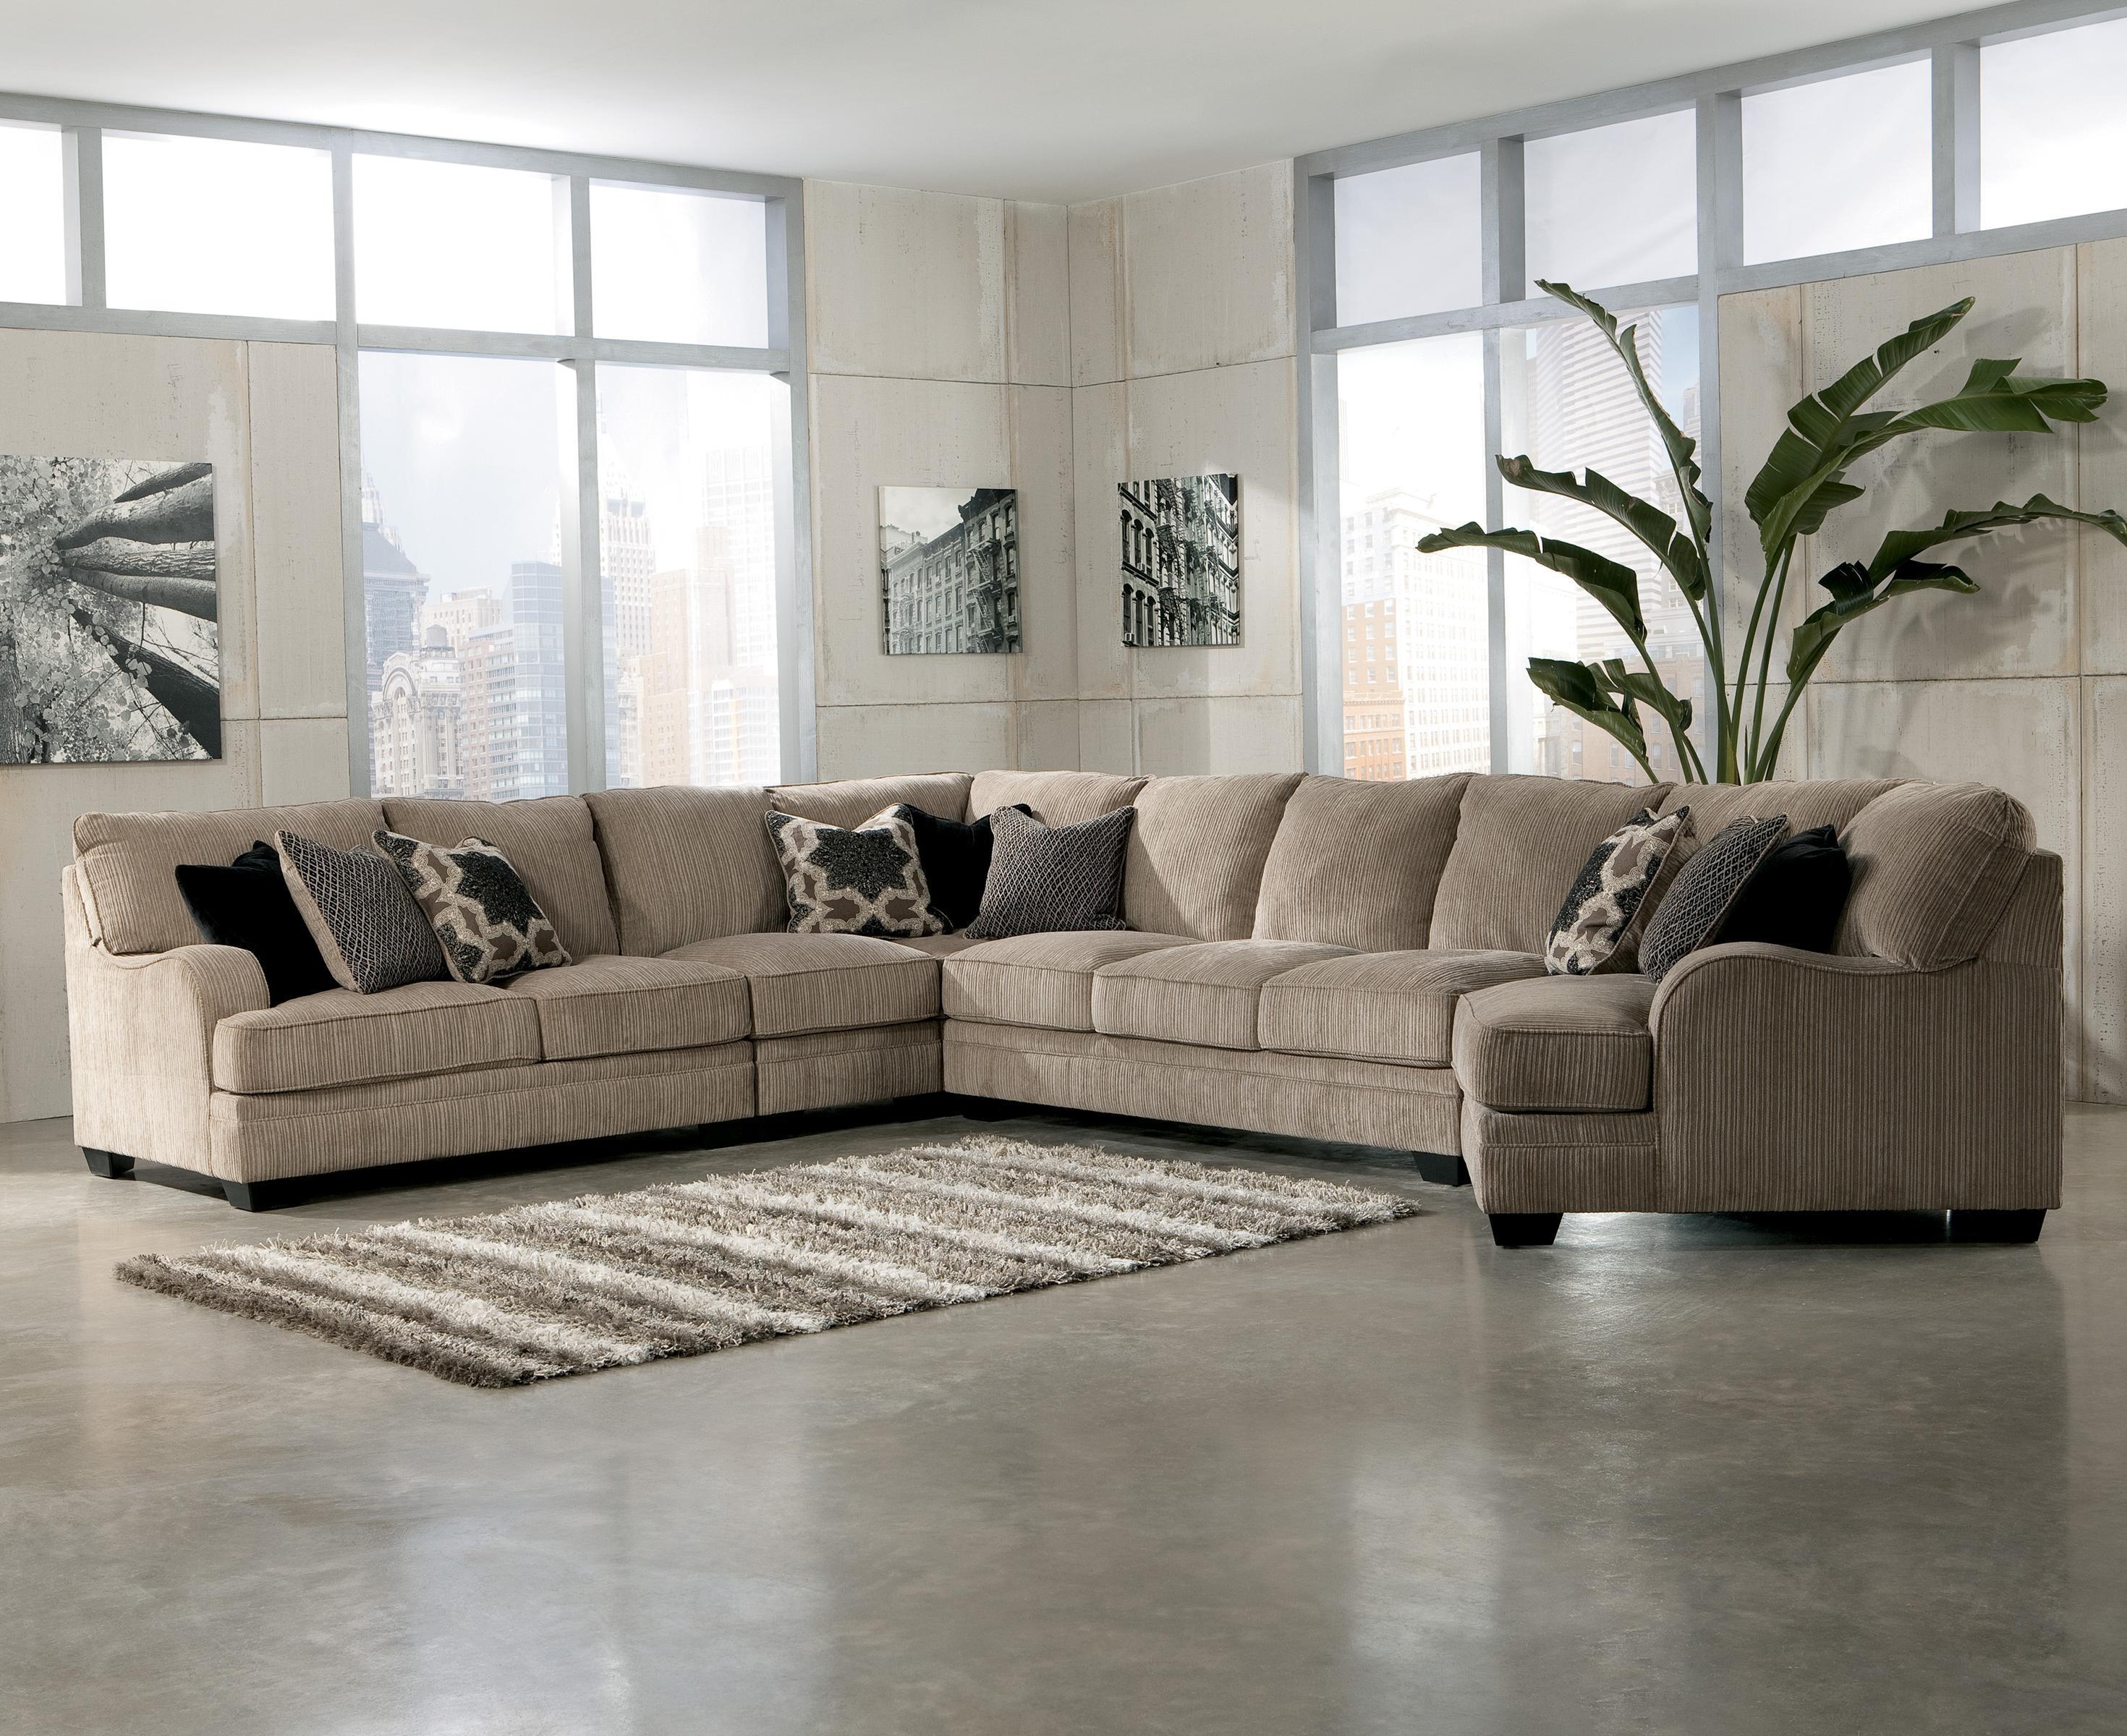 Signature Designashley Katisha – Platinum 5 Piece Sectional Pertaining To Individual Piece Sectional Sofas (View 9 of 20)